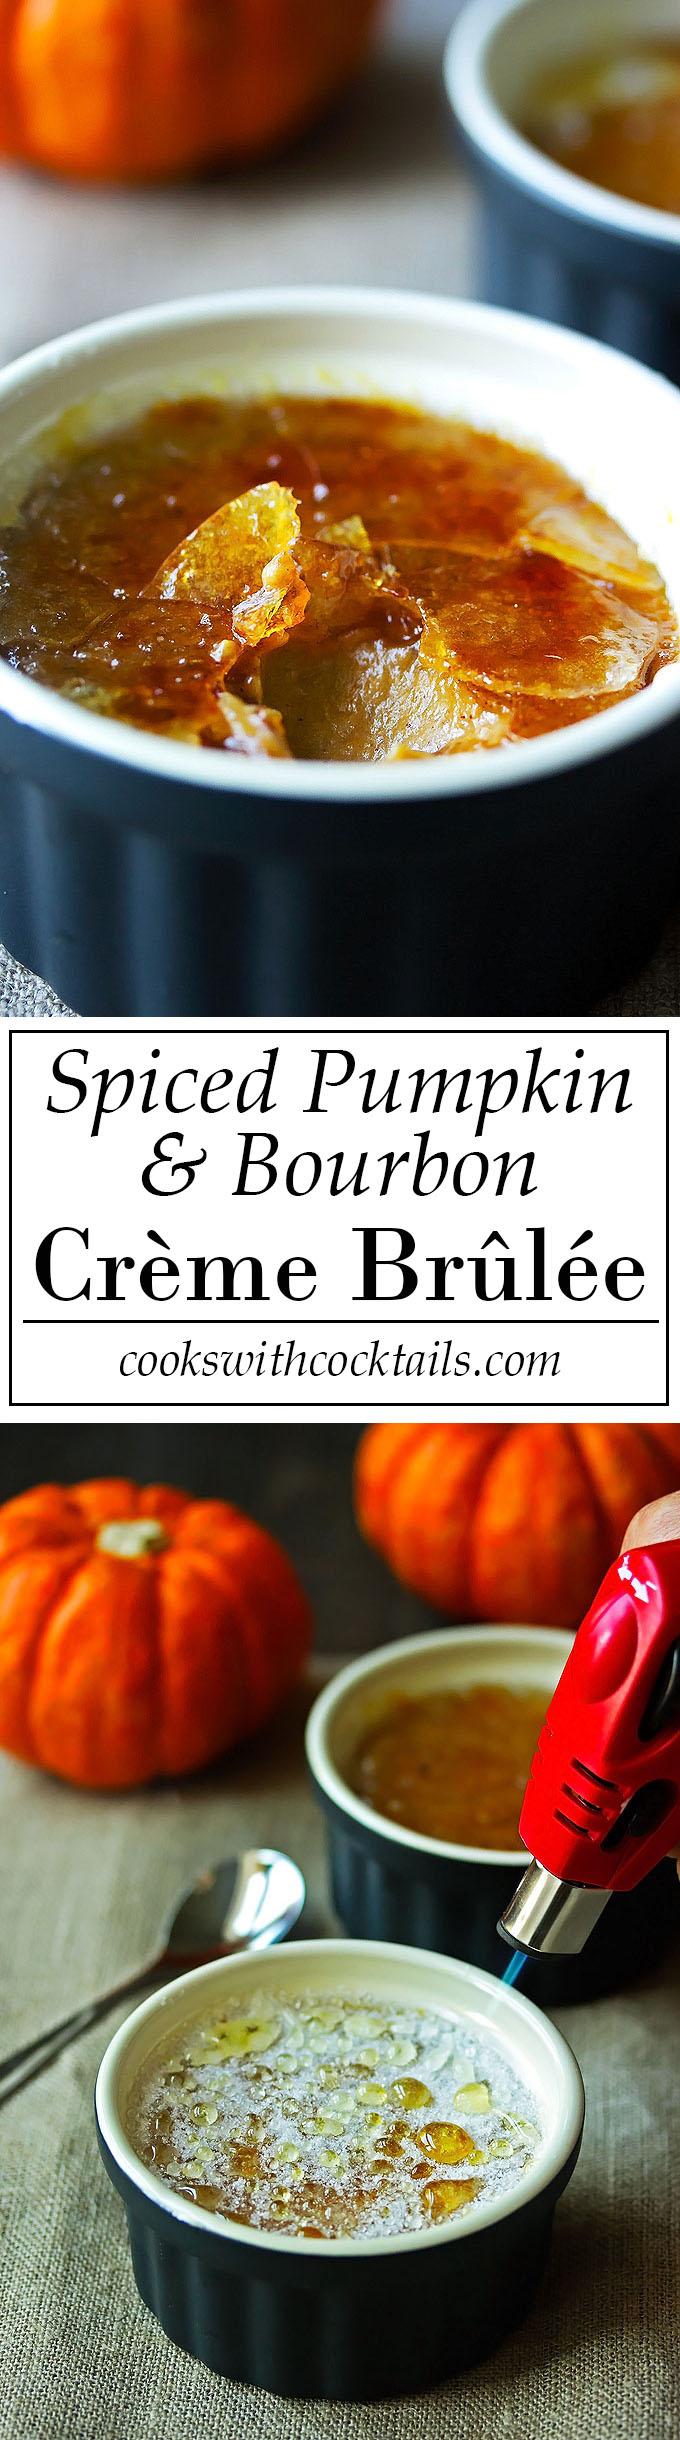 Spiced Pumpkin & Bourbon Crème Brûlée